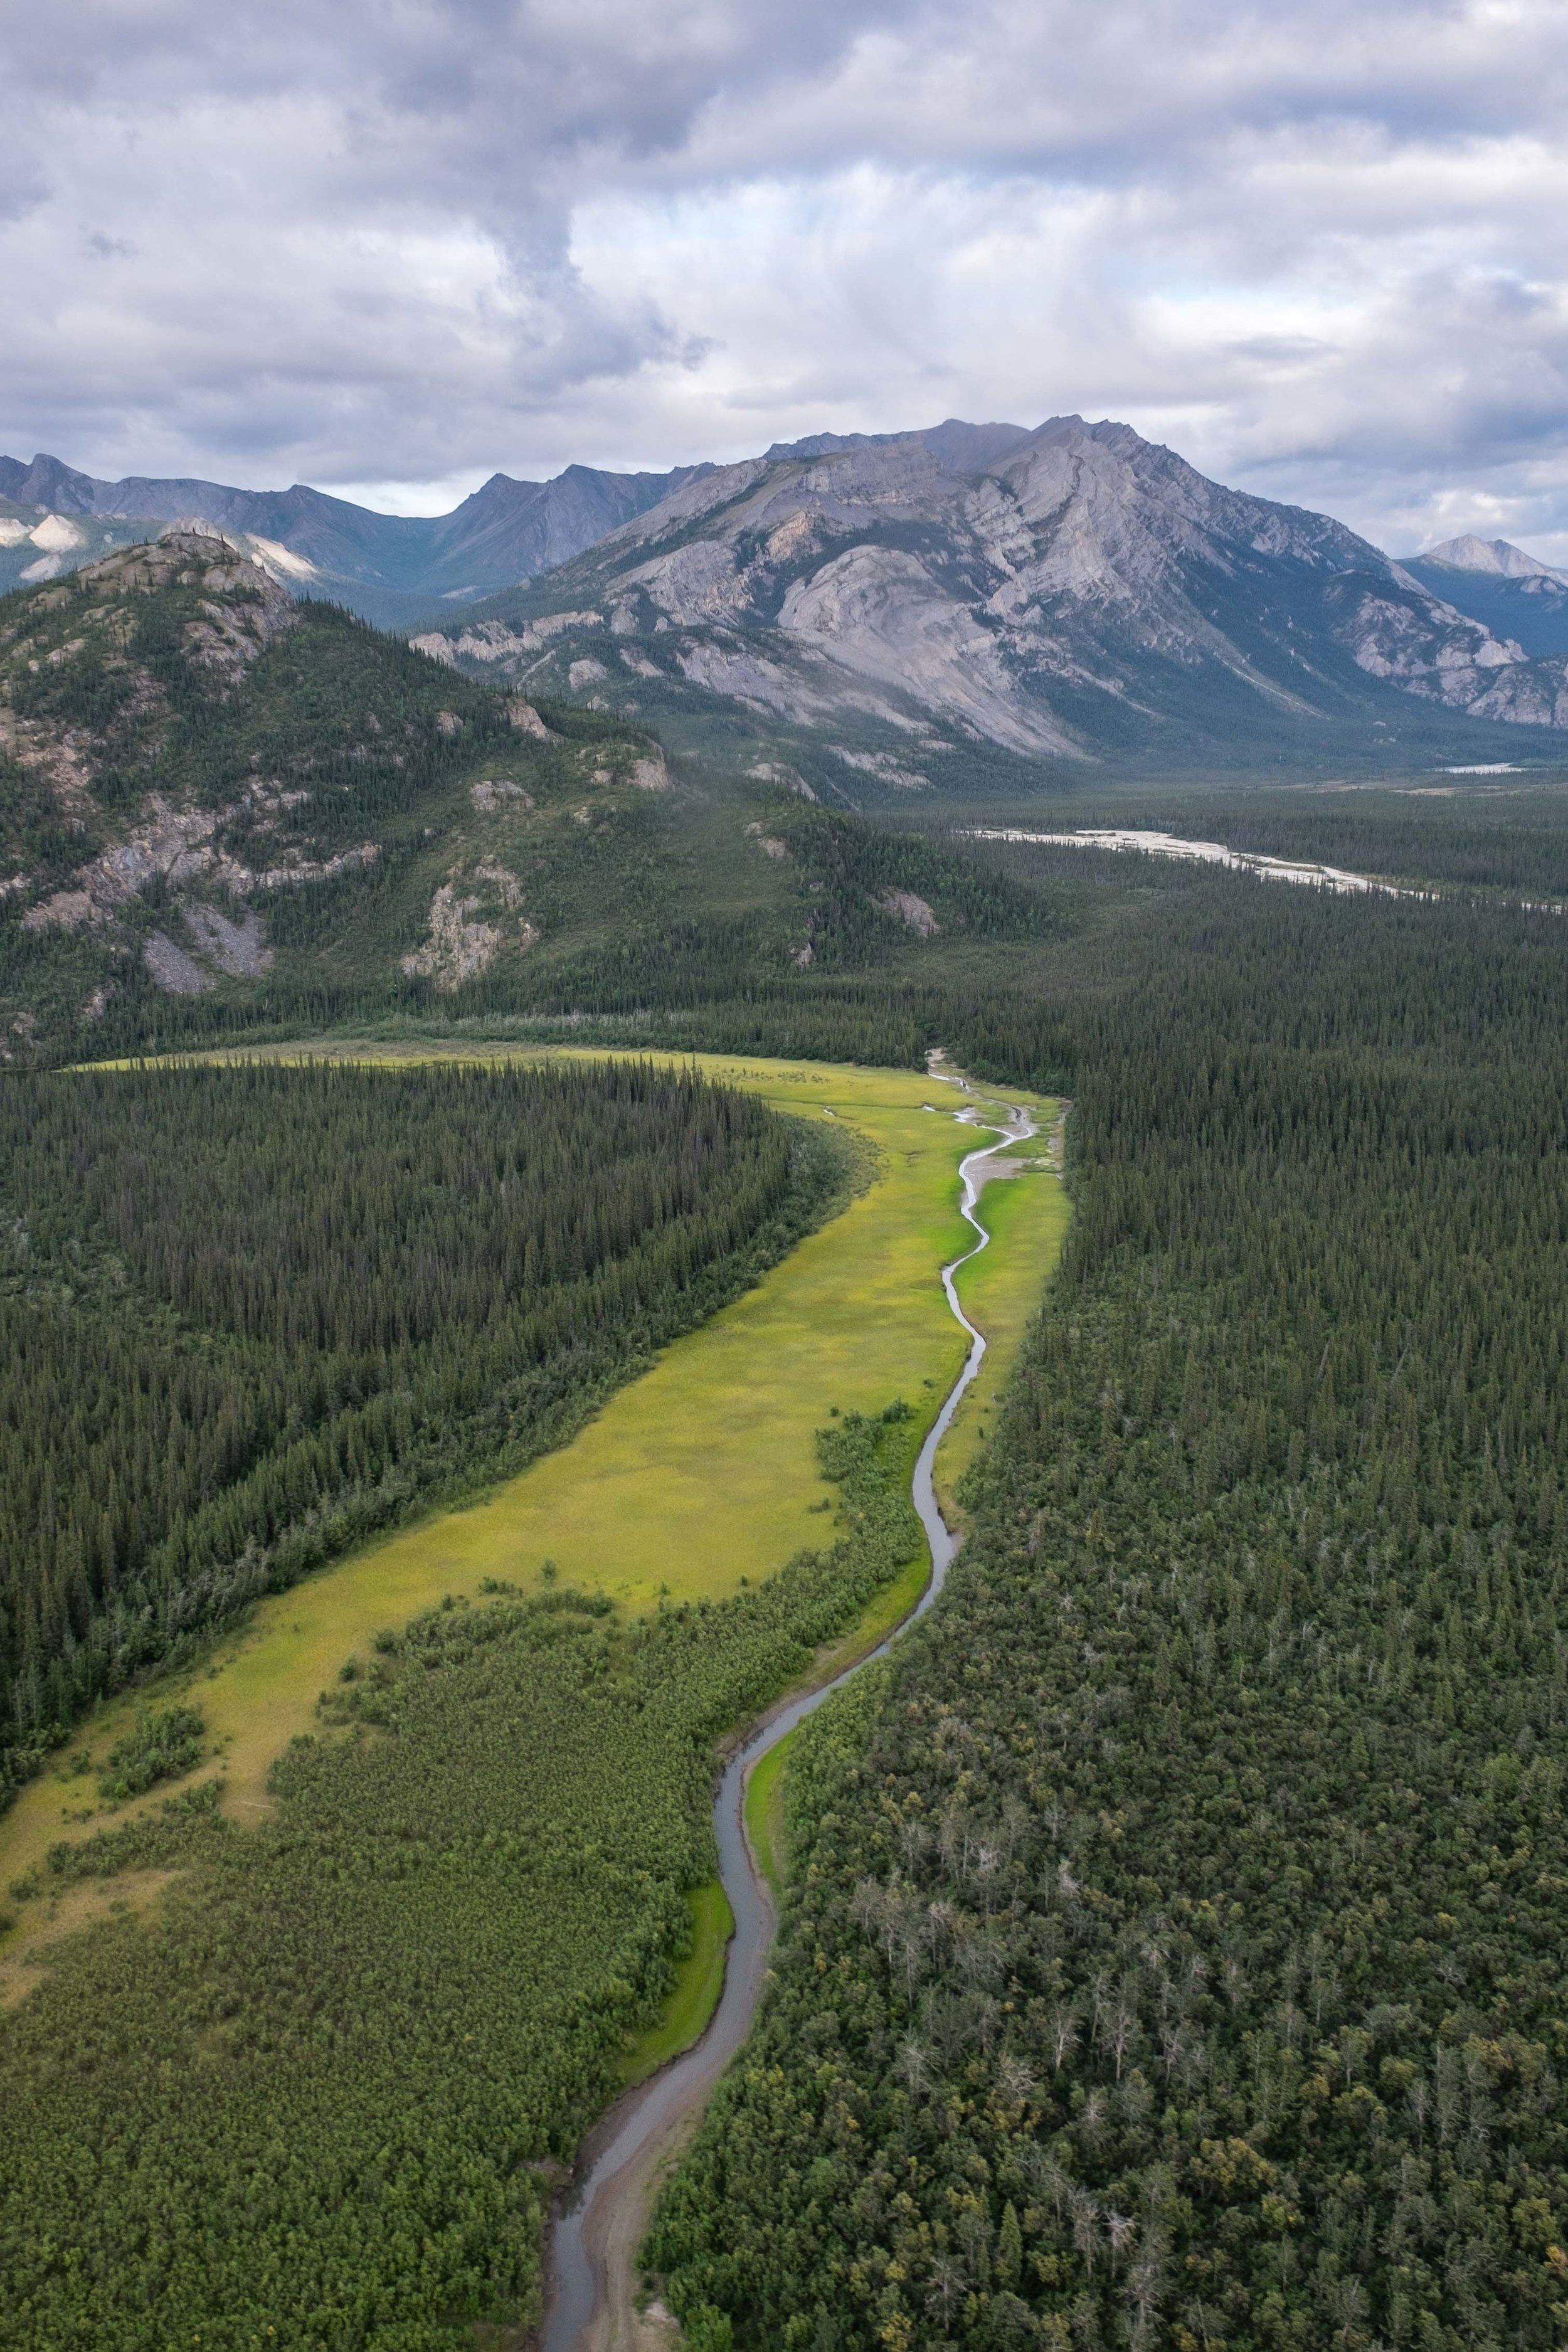 20160804-JI-Gates of the Arctic National Park-_DSF0292.jpg